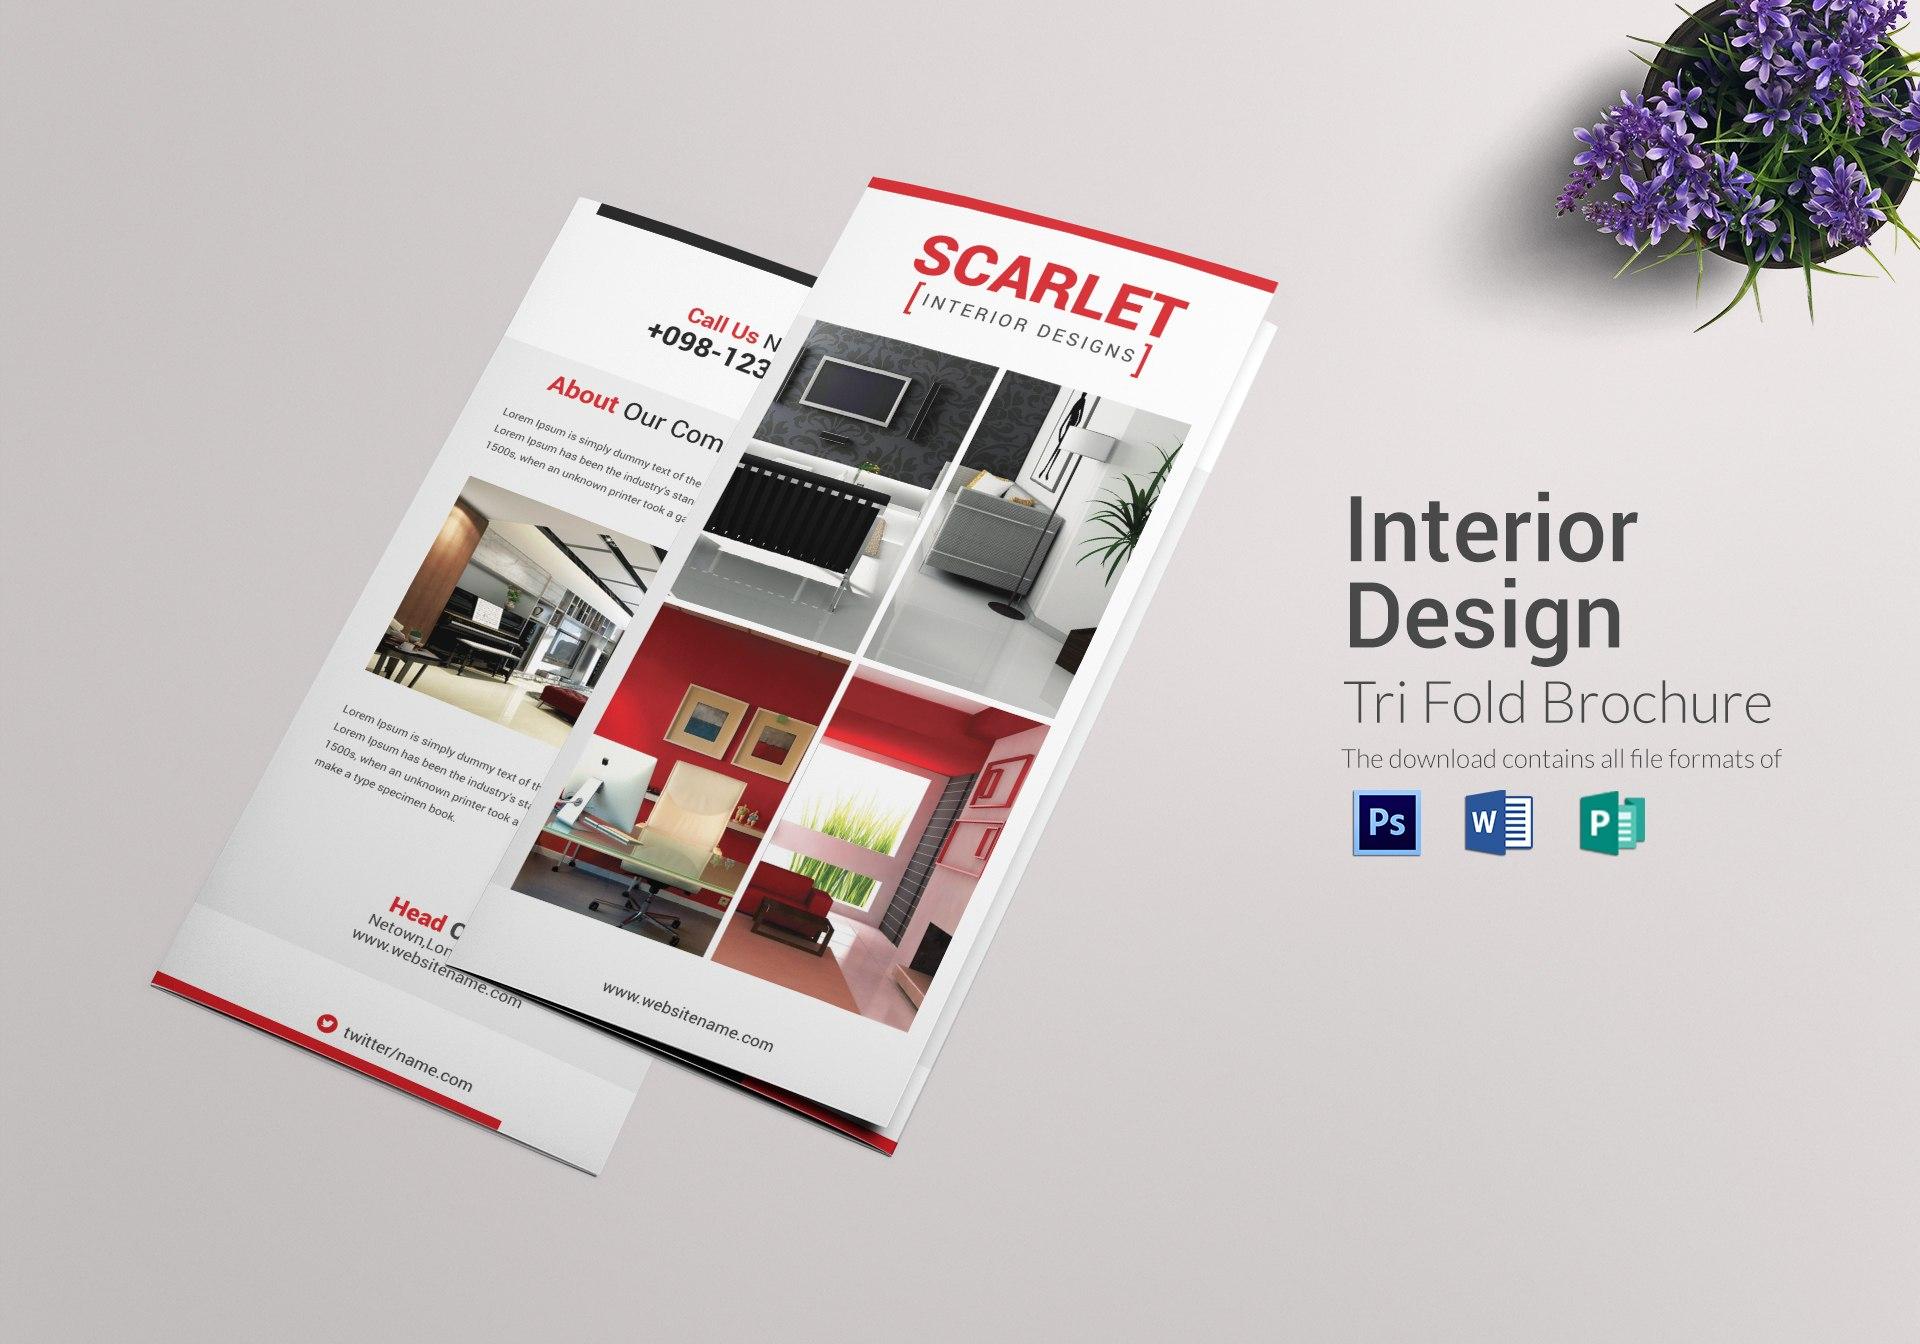 Trifold Interior Design Brochure Template In Tri Fold Brochure Publisher Template